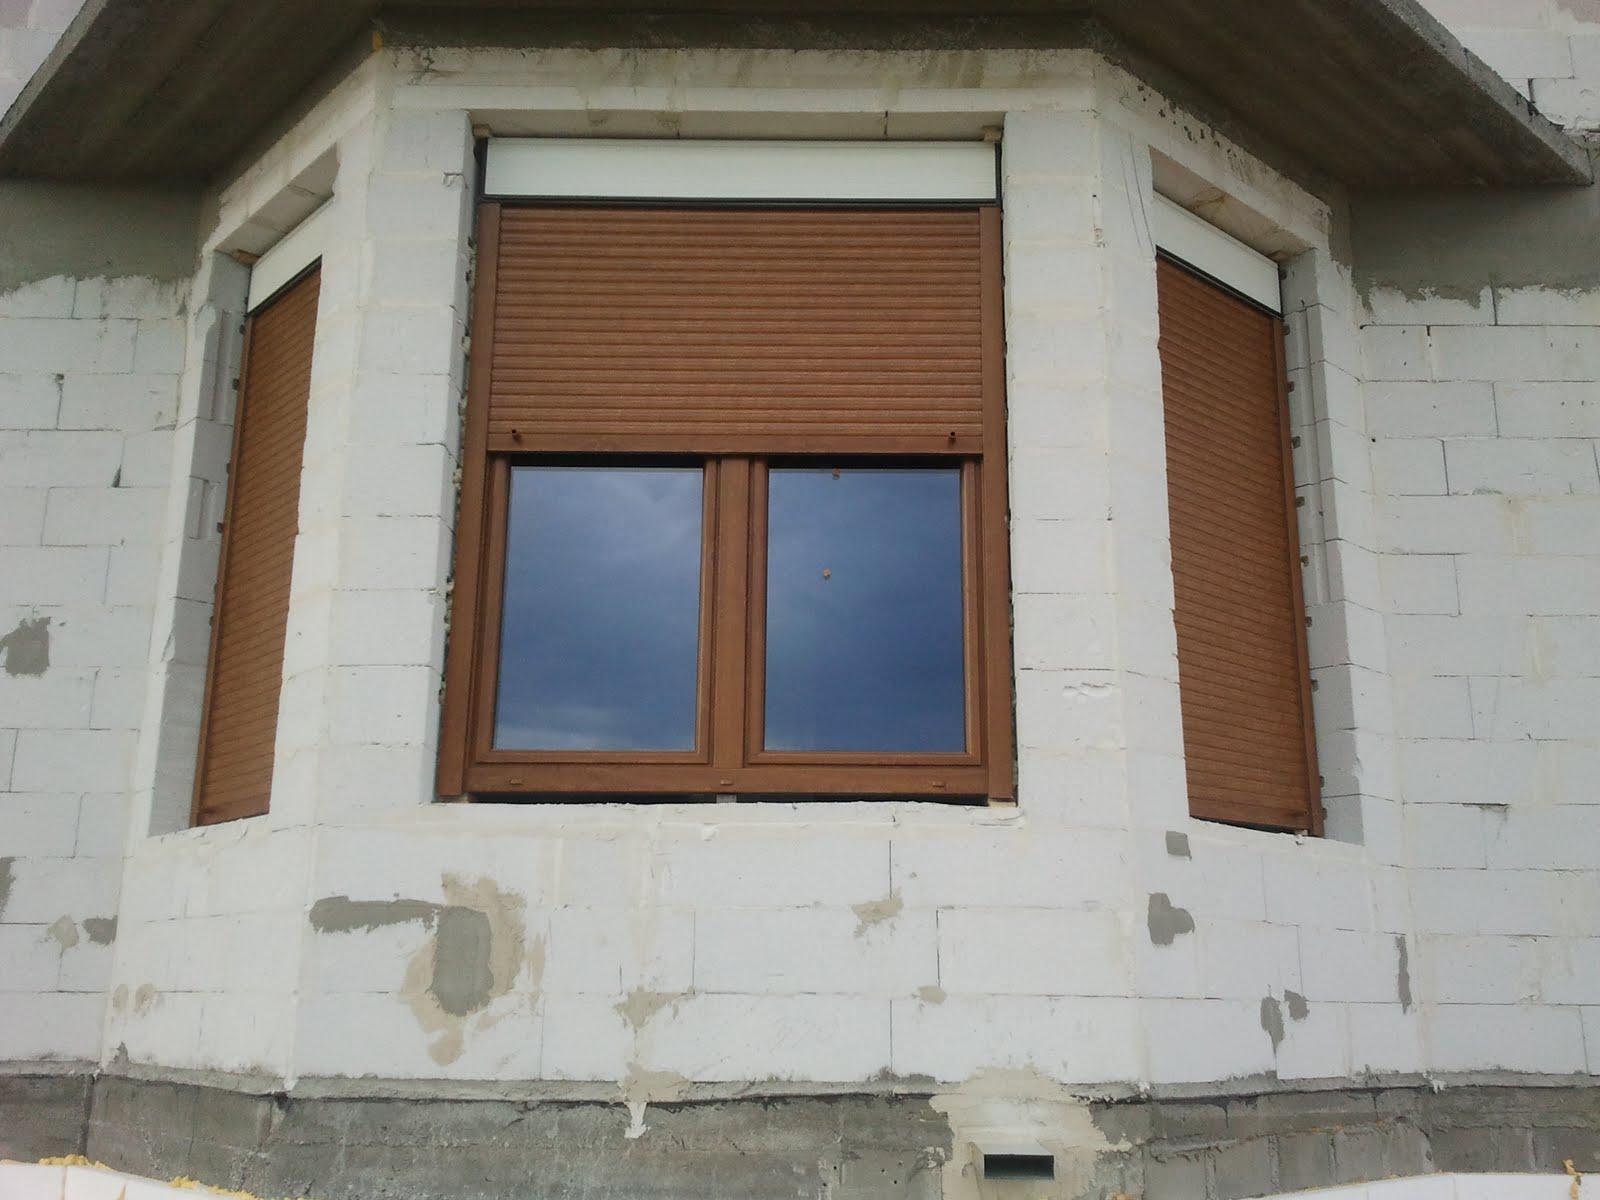 Chłodny Chaber lux - budowa domu: Okna i rolety WH52